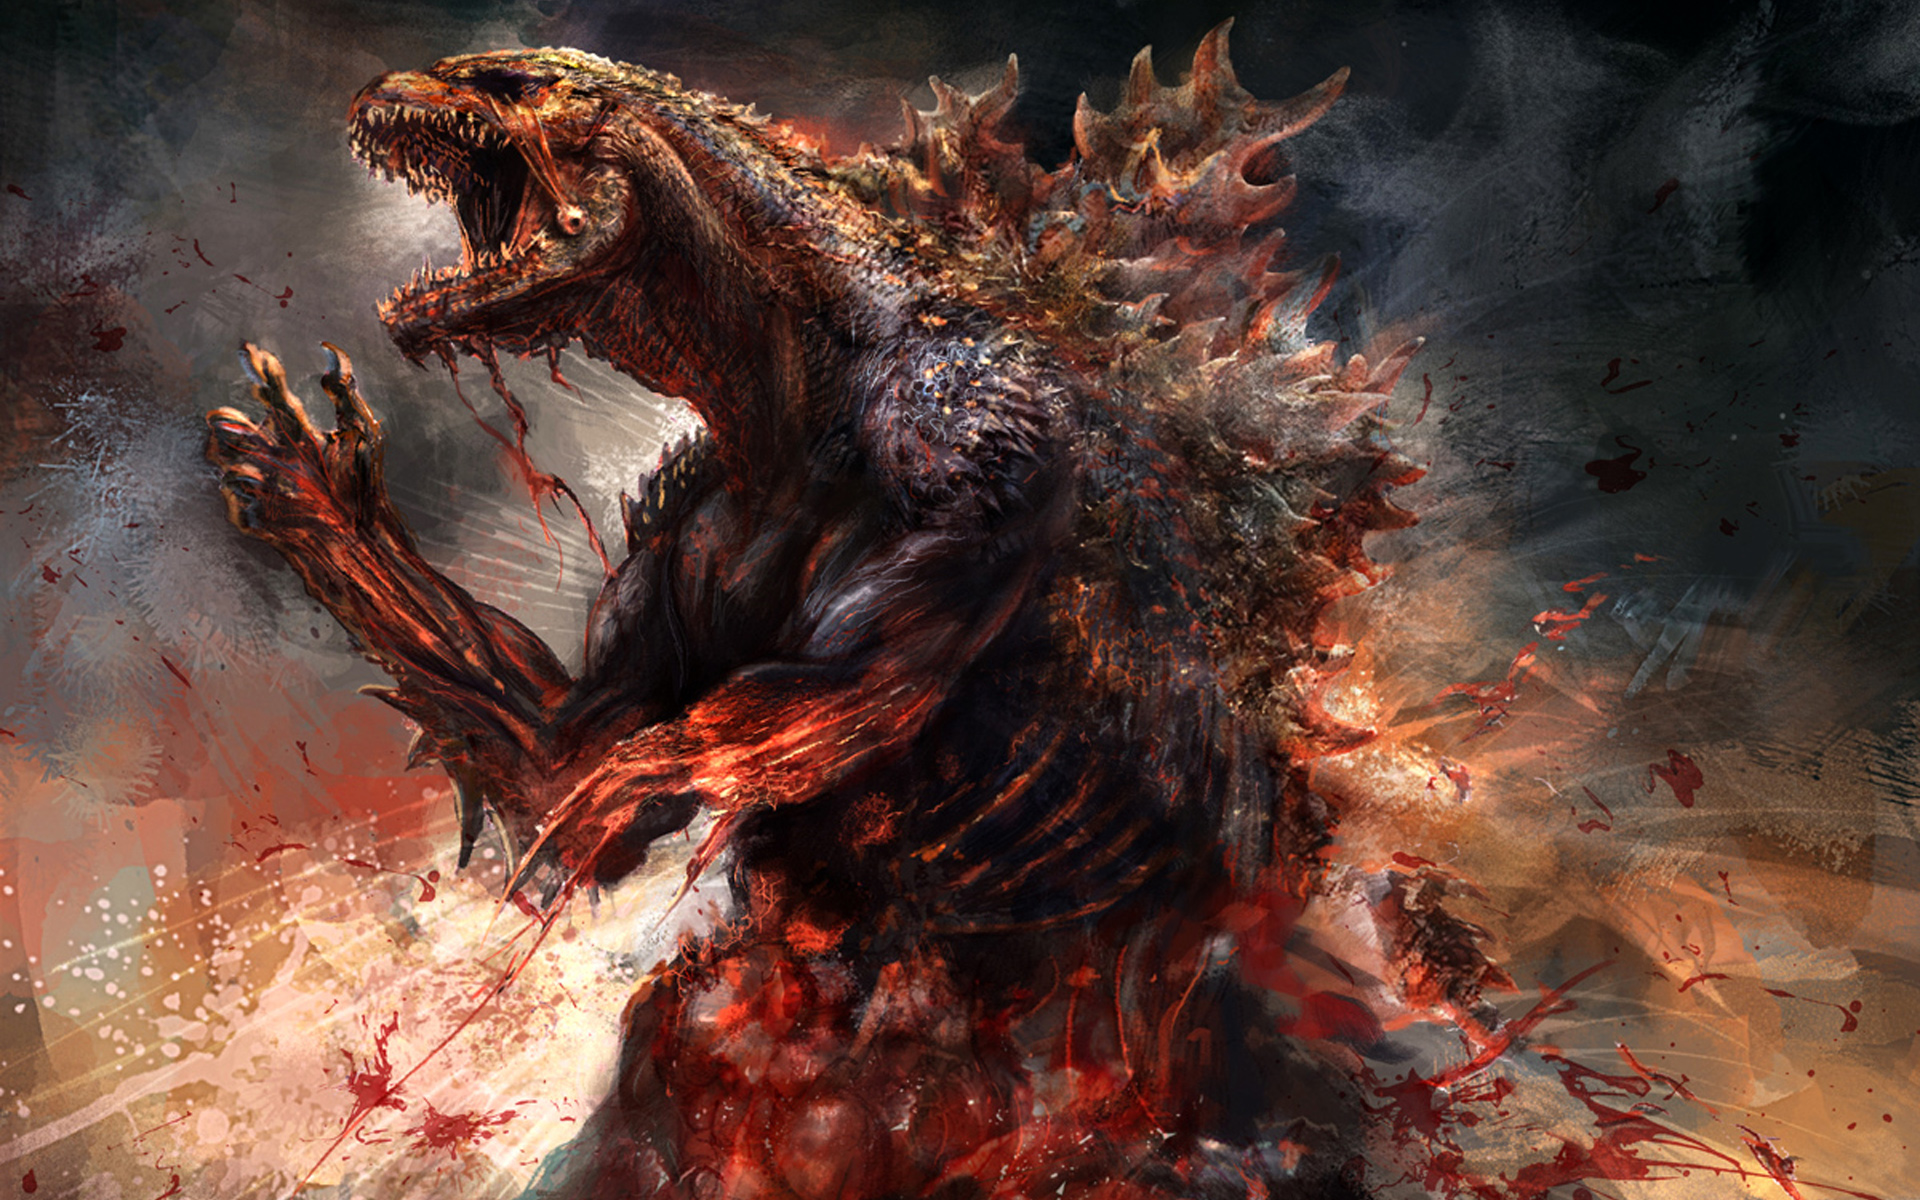 Godzilla 2014 Concept Artwork HD Wallpaper 1920x1200